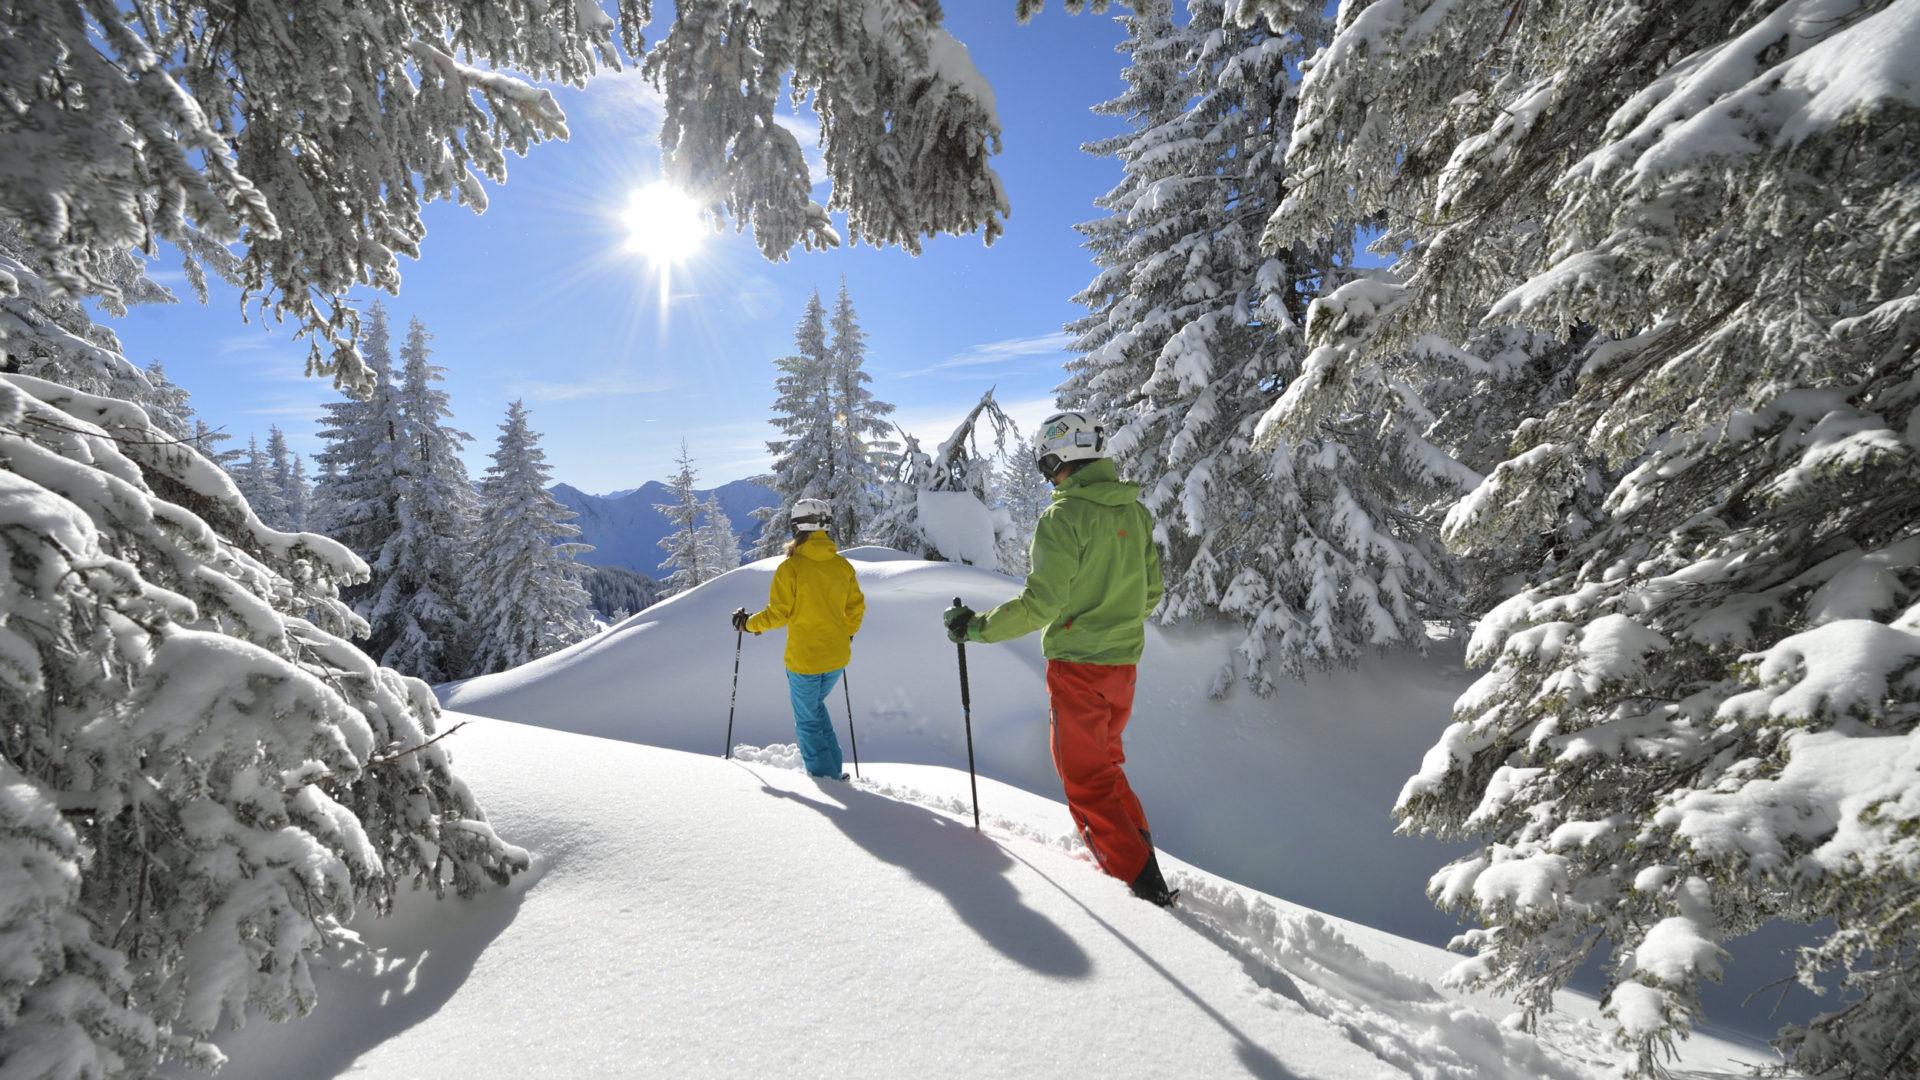 Skigebiet Laterns Gapfohl © Sepp Mallaun / Vorarlberg Tourismus